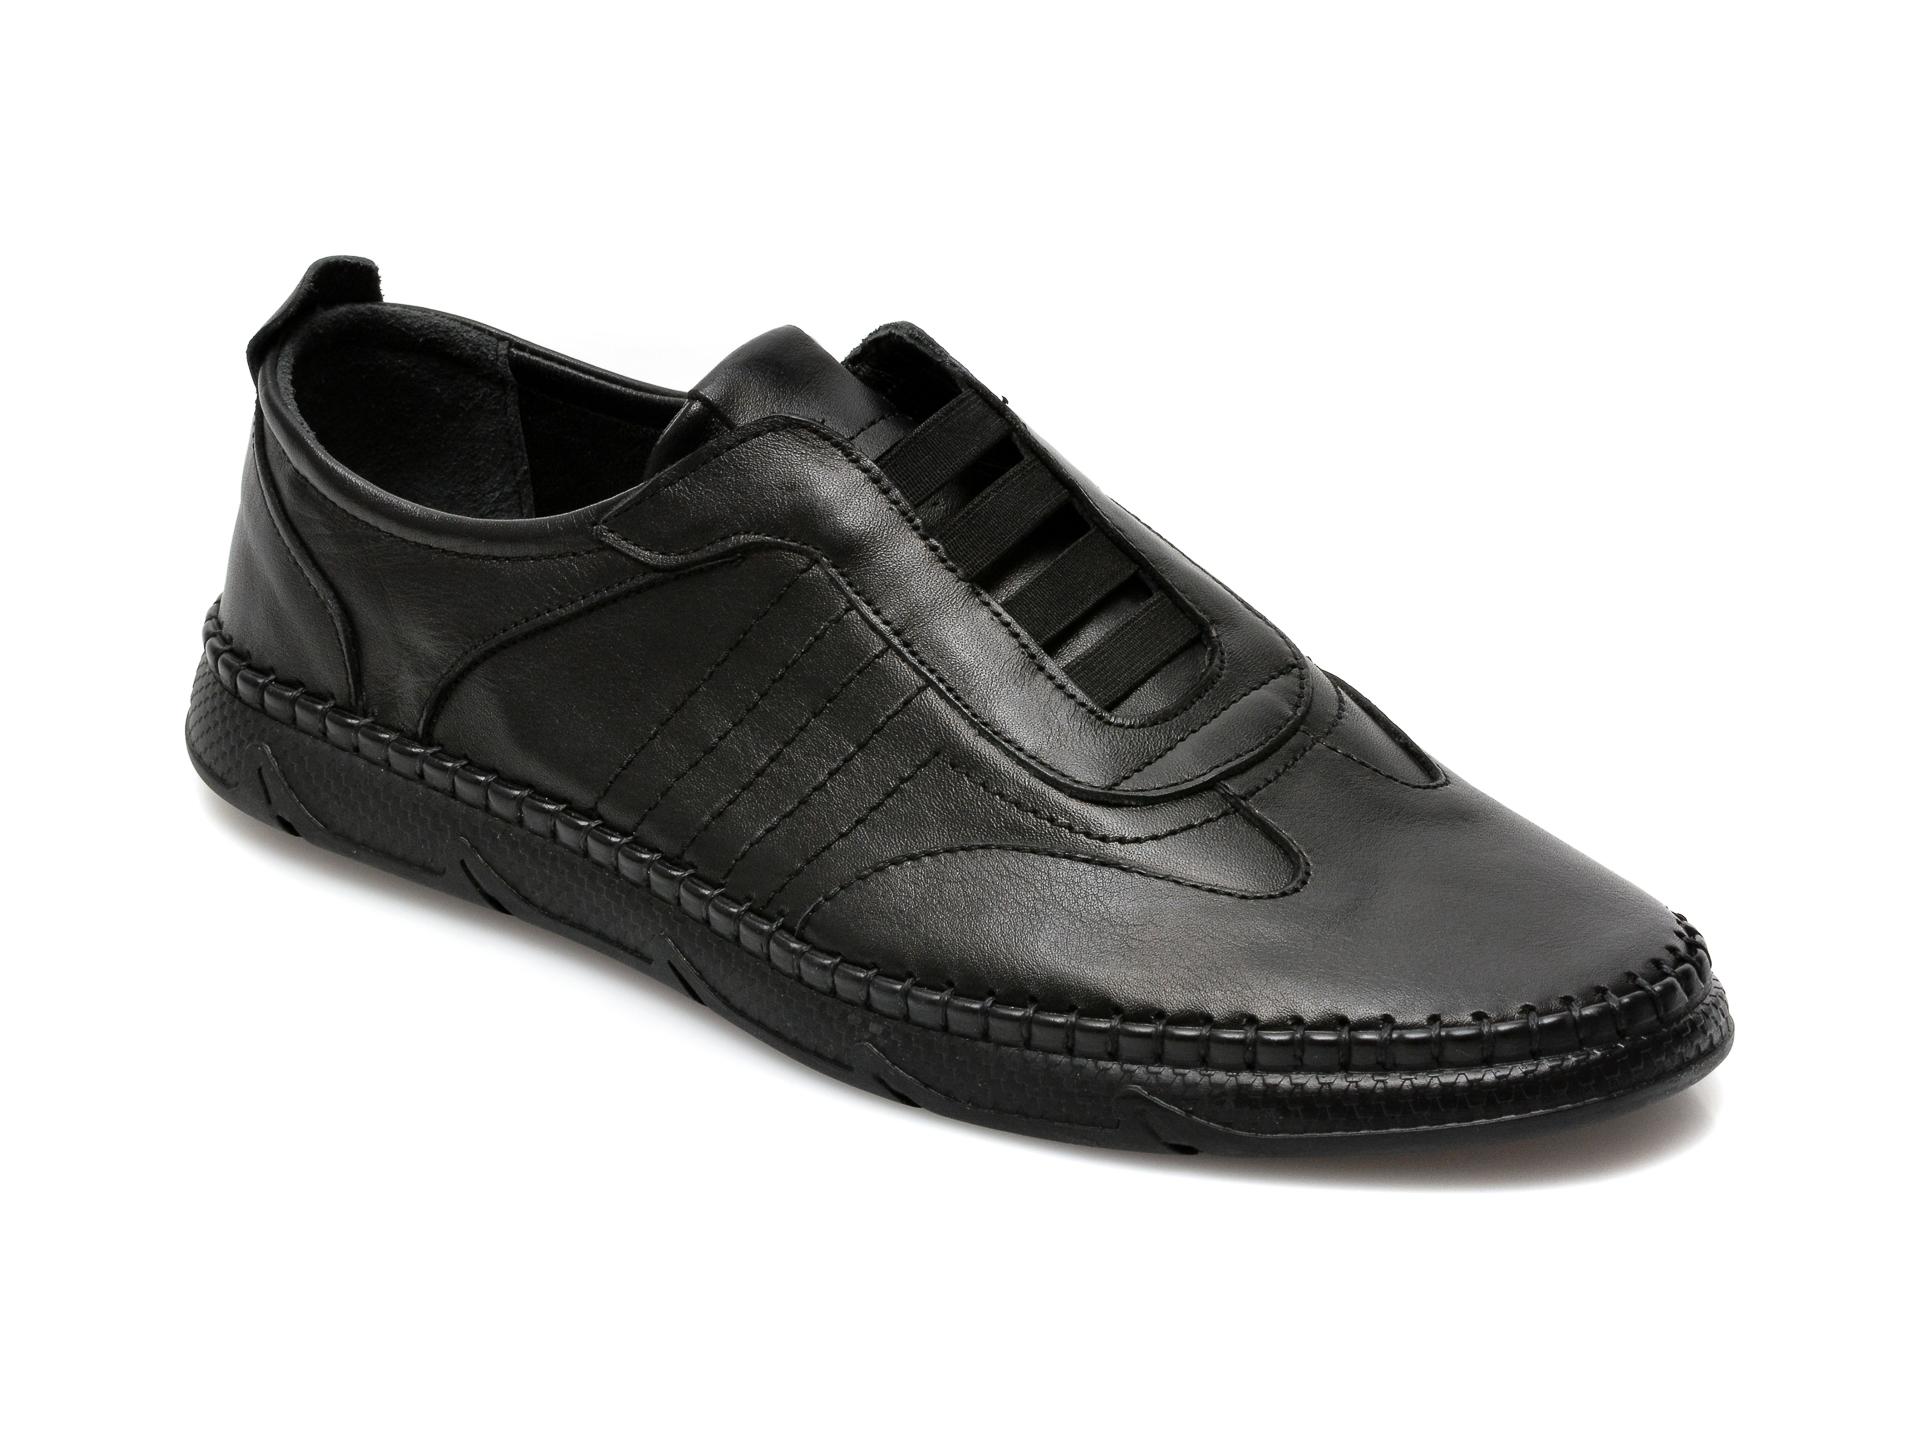 Pantofi OTTER negri, M5652, din piele naturala